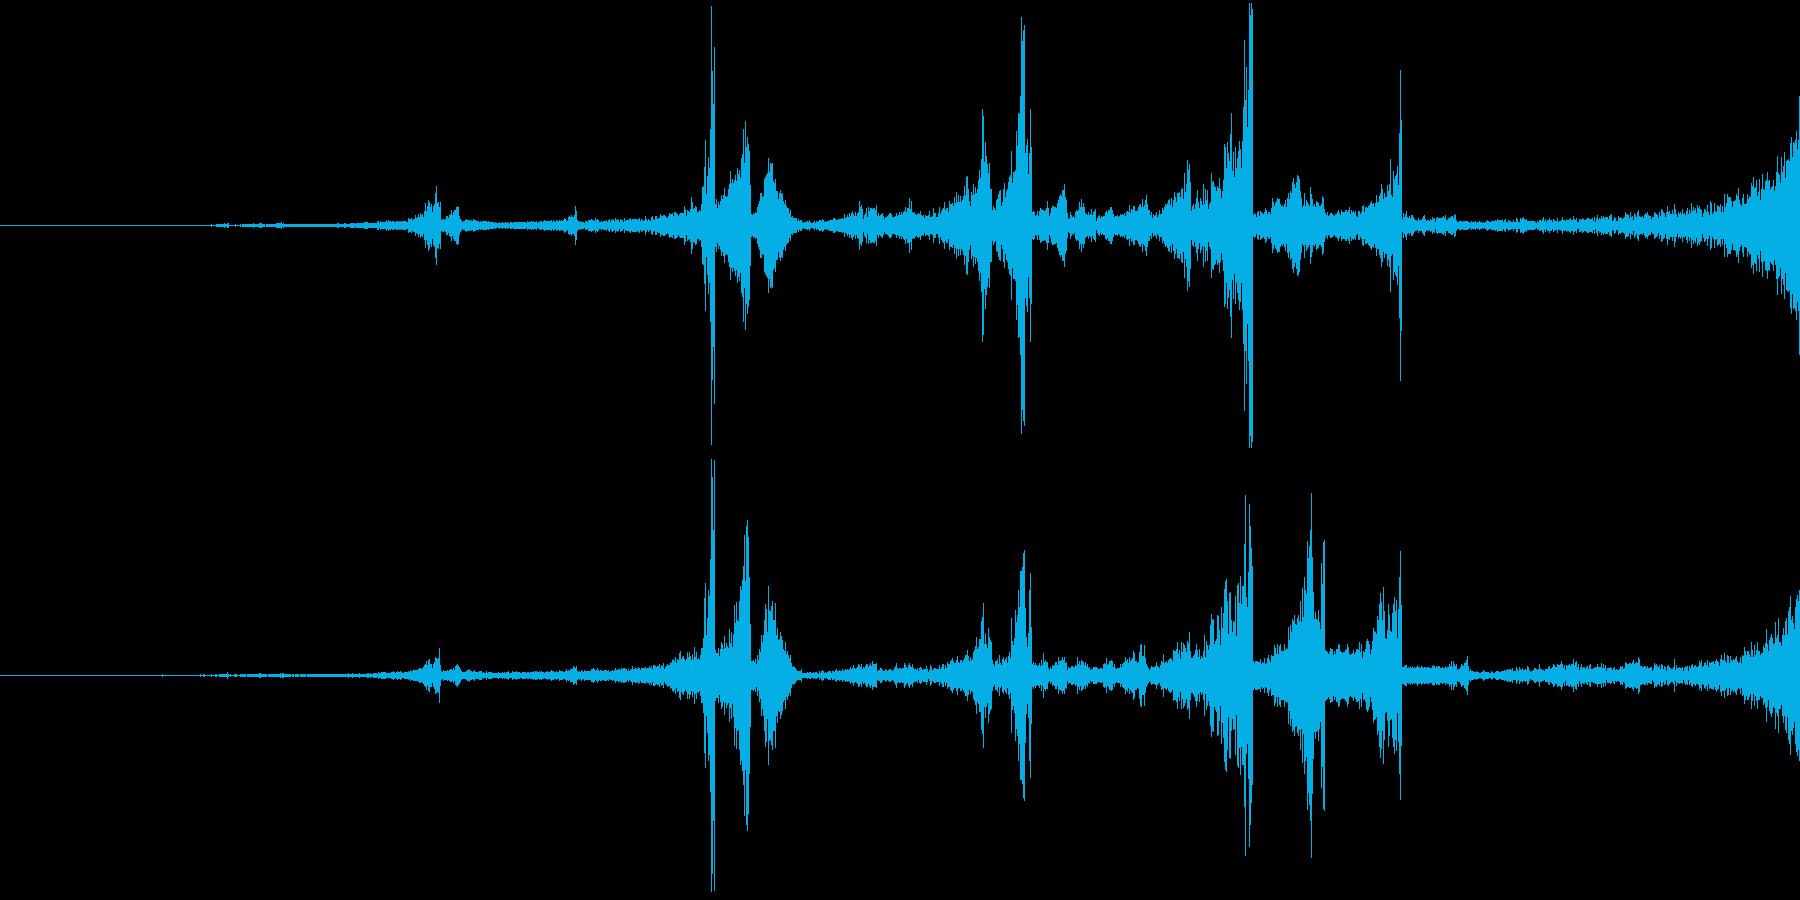 Zap 巻き戻し音・ザップ効果音 4の再生済みの波形